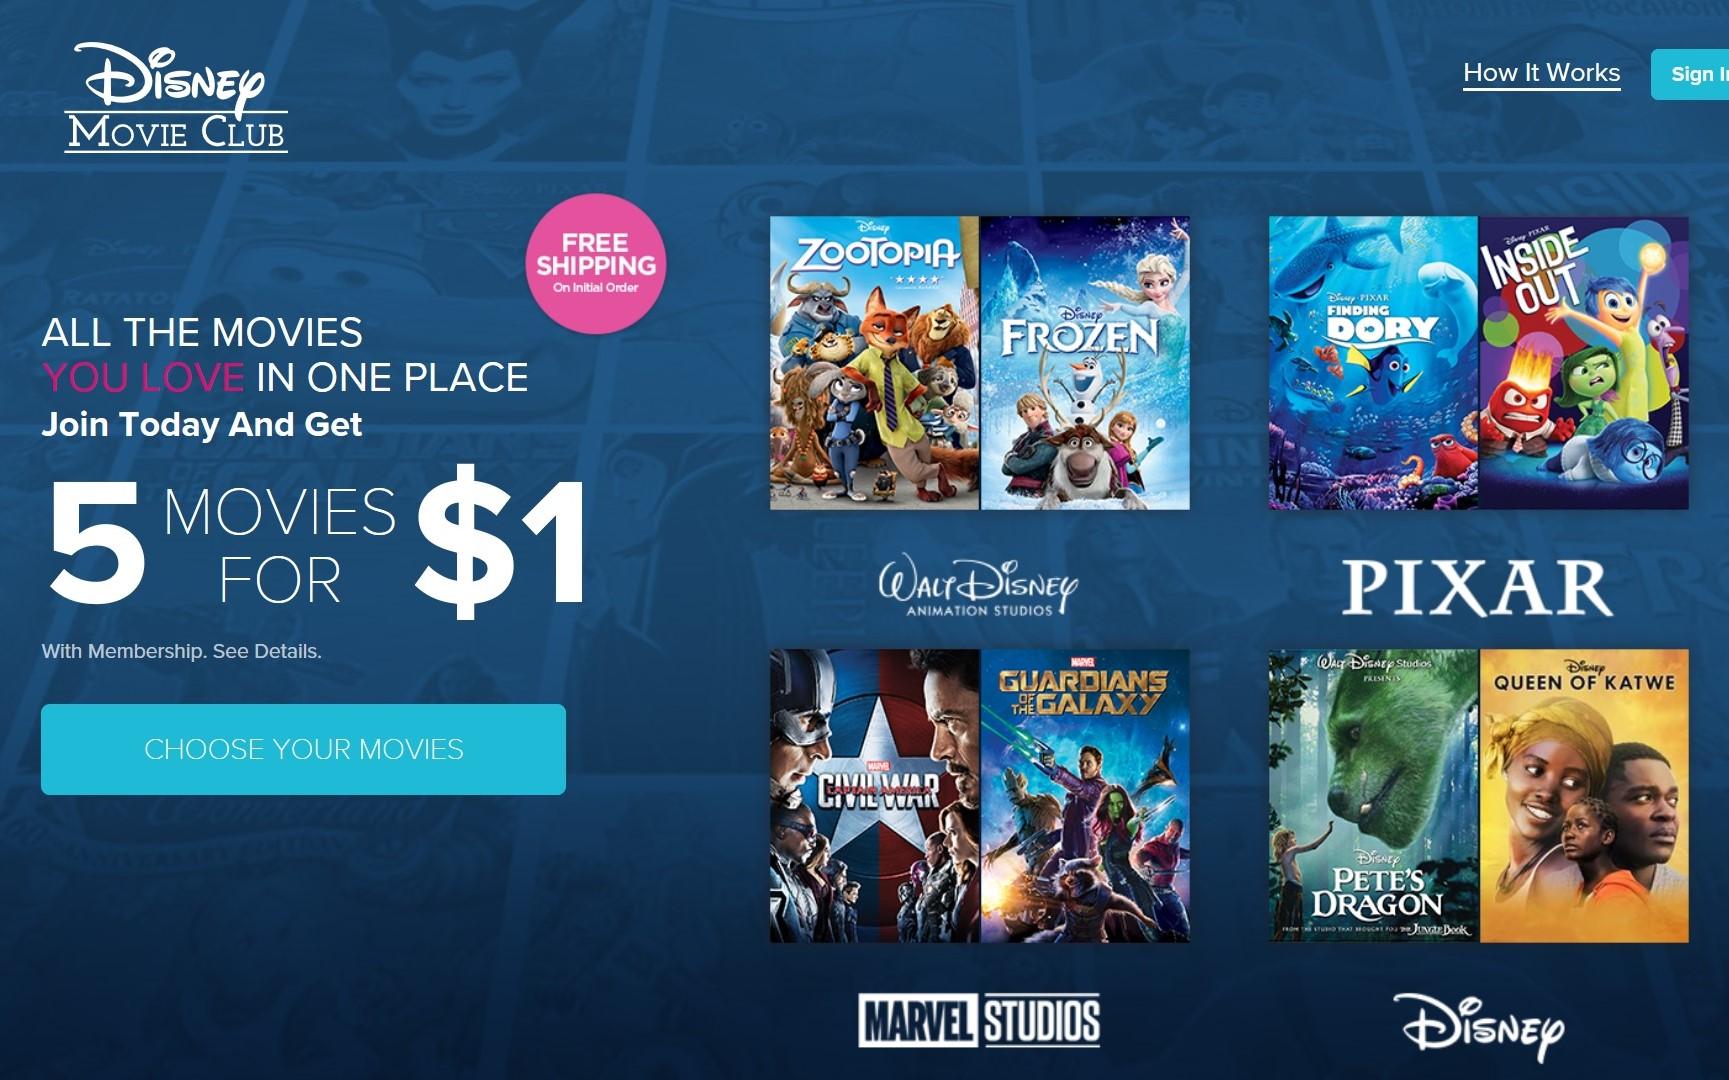 Get 5 Disney, Marvel, or Star Wars Blu-Rays or DVD